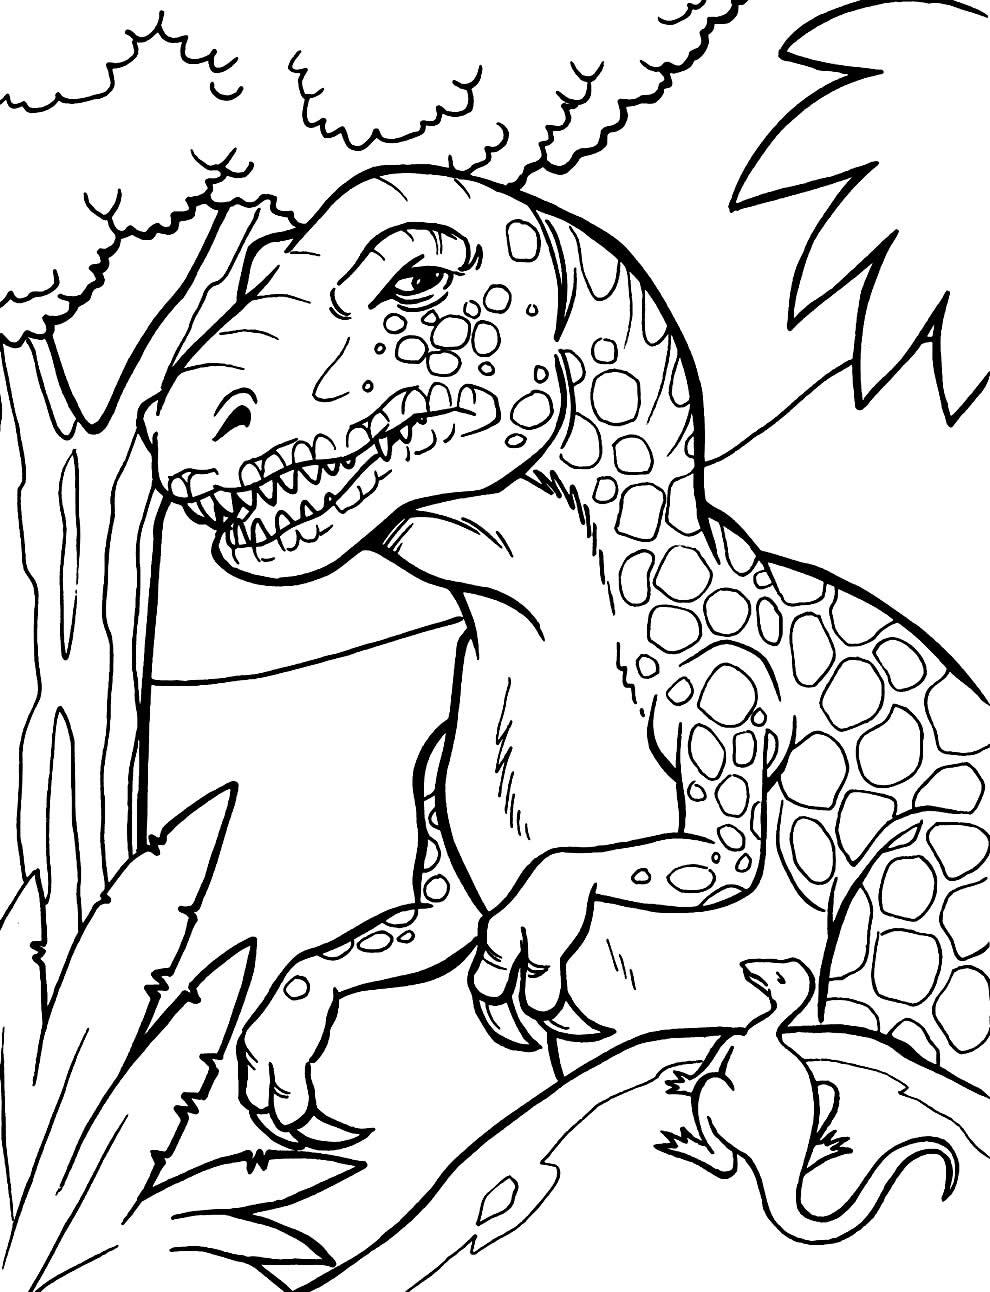 Molde de dinossauro para colorir